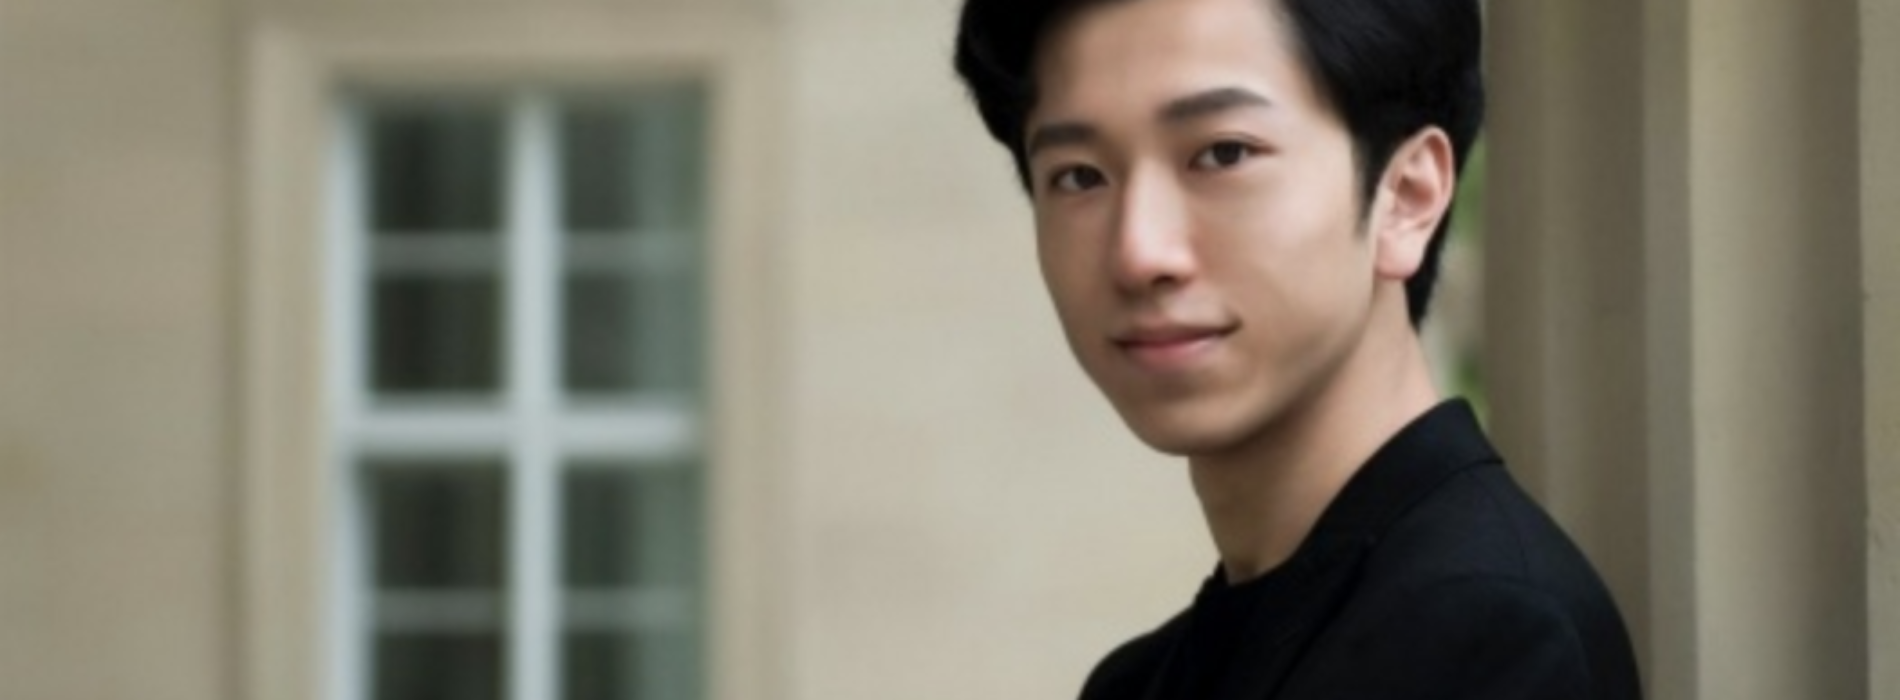 SummerConcert, protagonista a Carinola il pianista Ziyu Liu